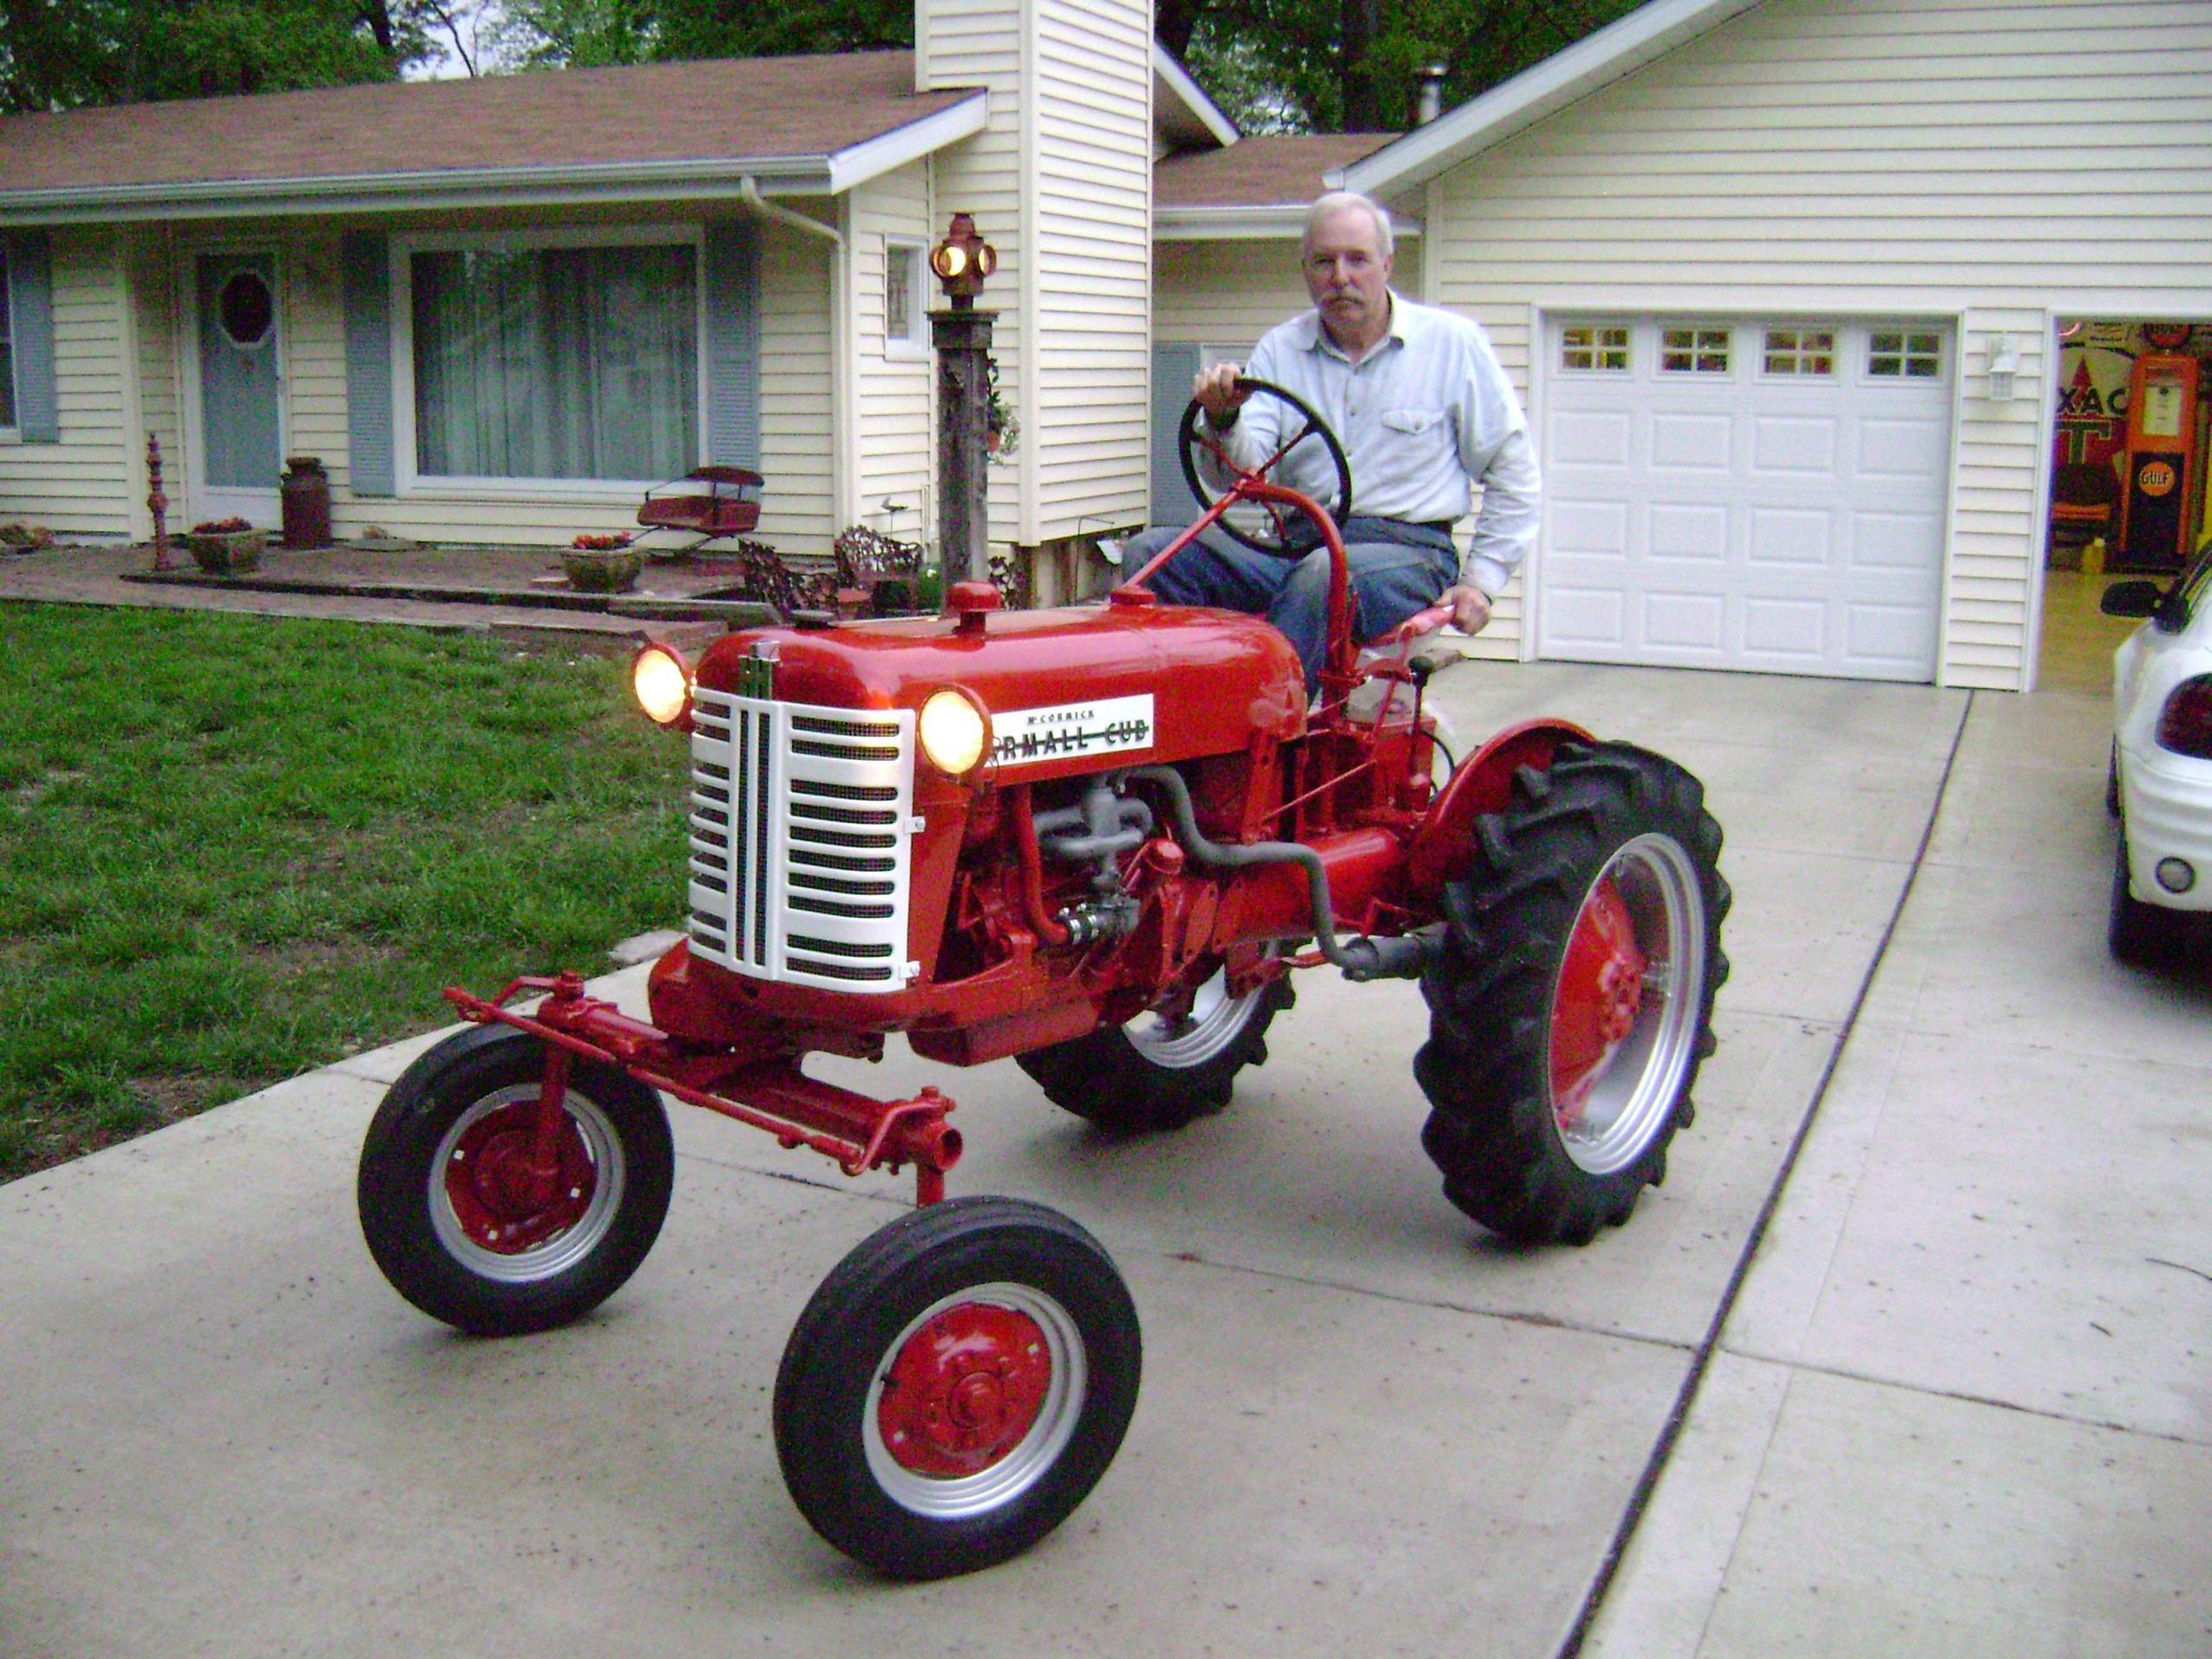 Restored Ih Tractors : My dad s restored farmall cub pics trains planes